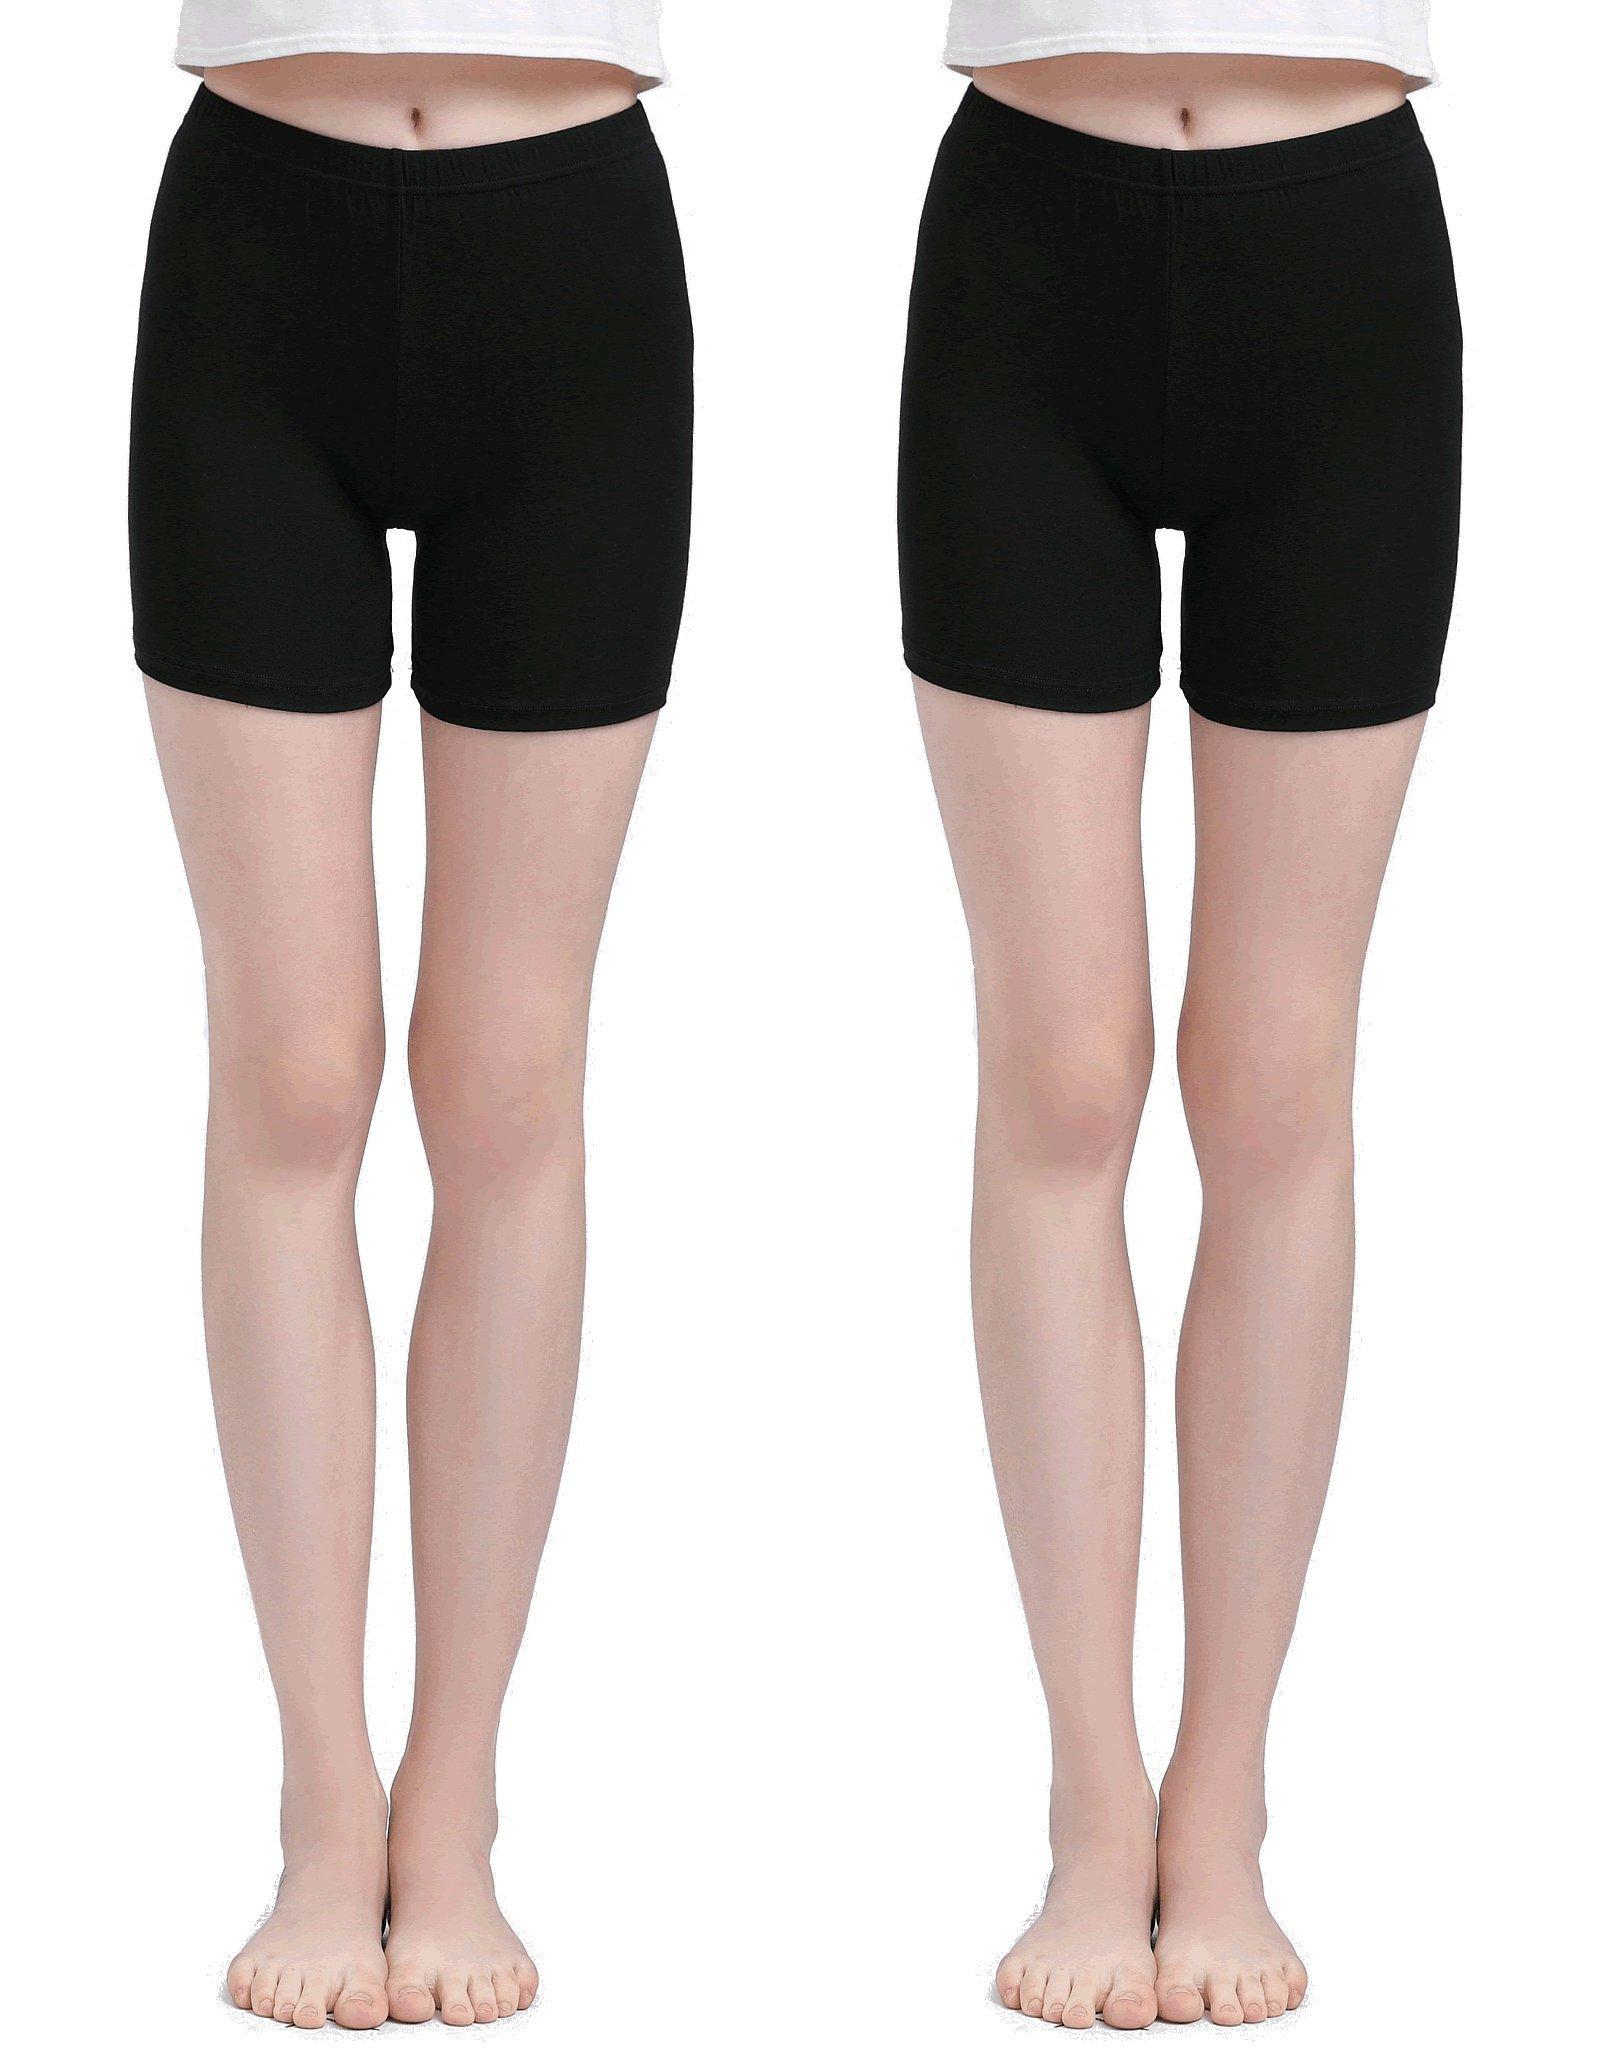 Vinconie Black Knee Length Leggings Pants Under Dress Soft Thin Leggings